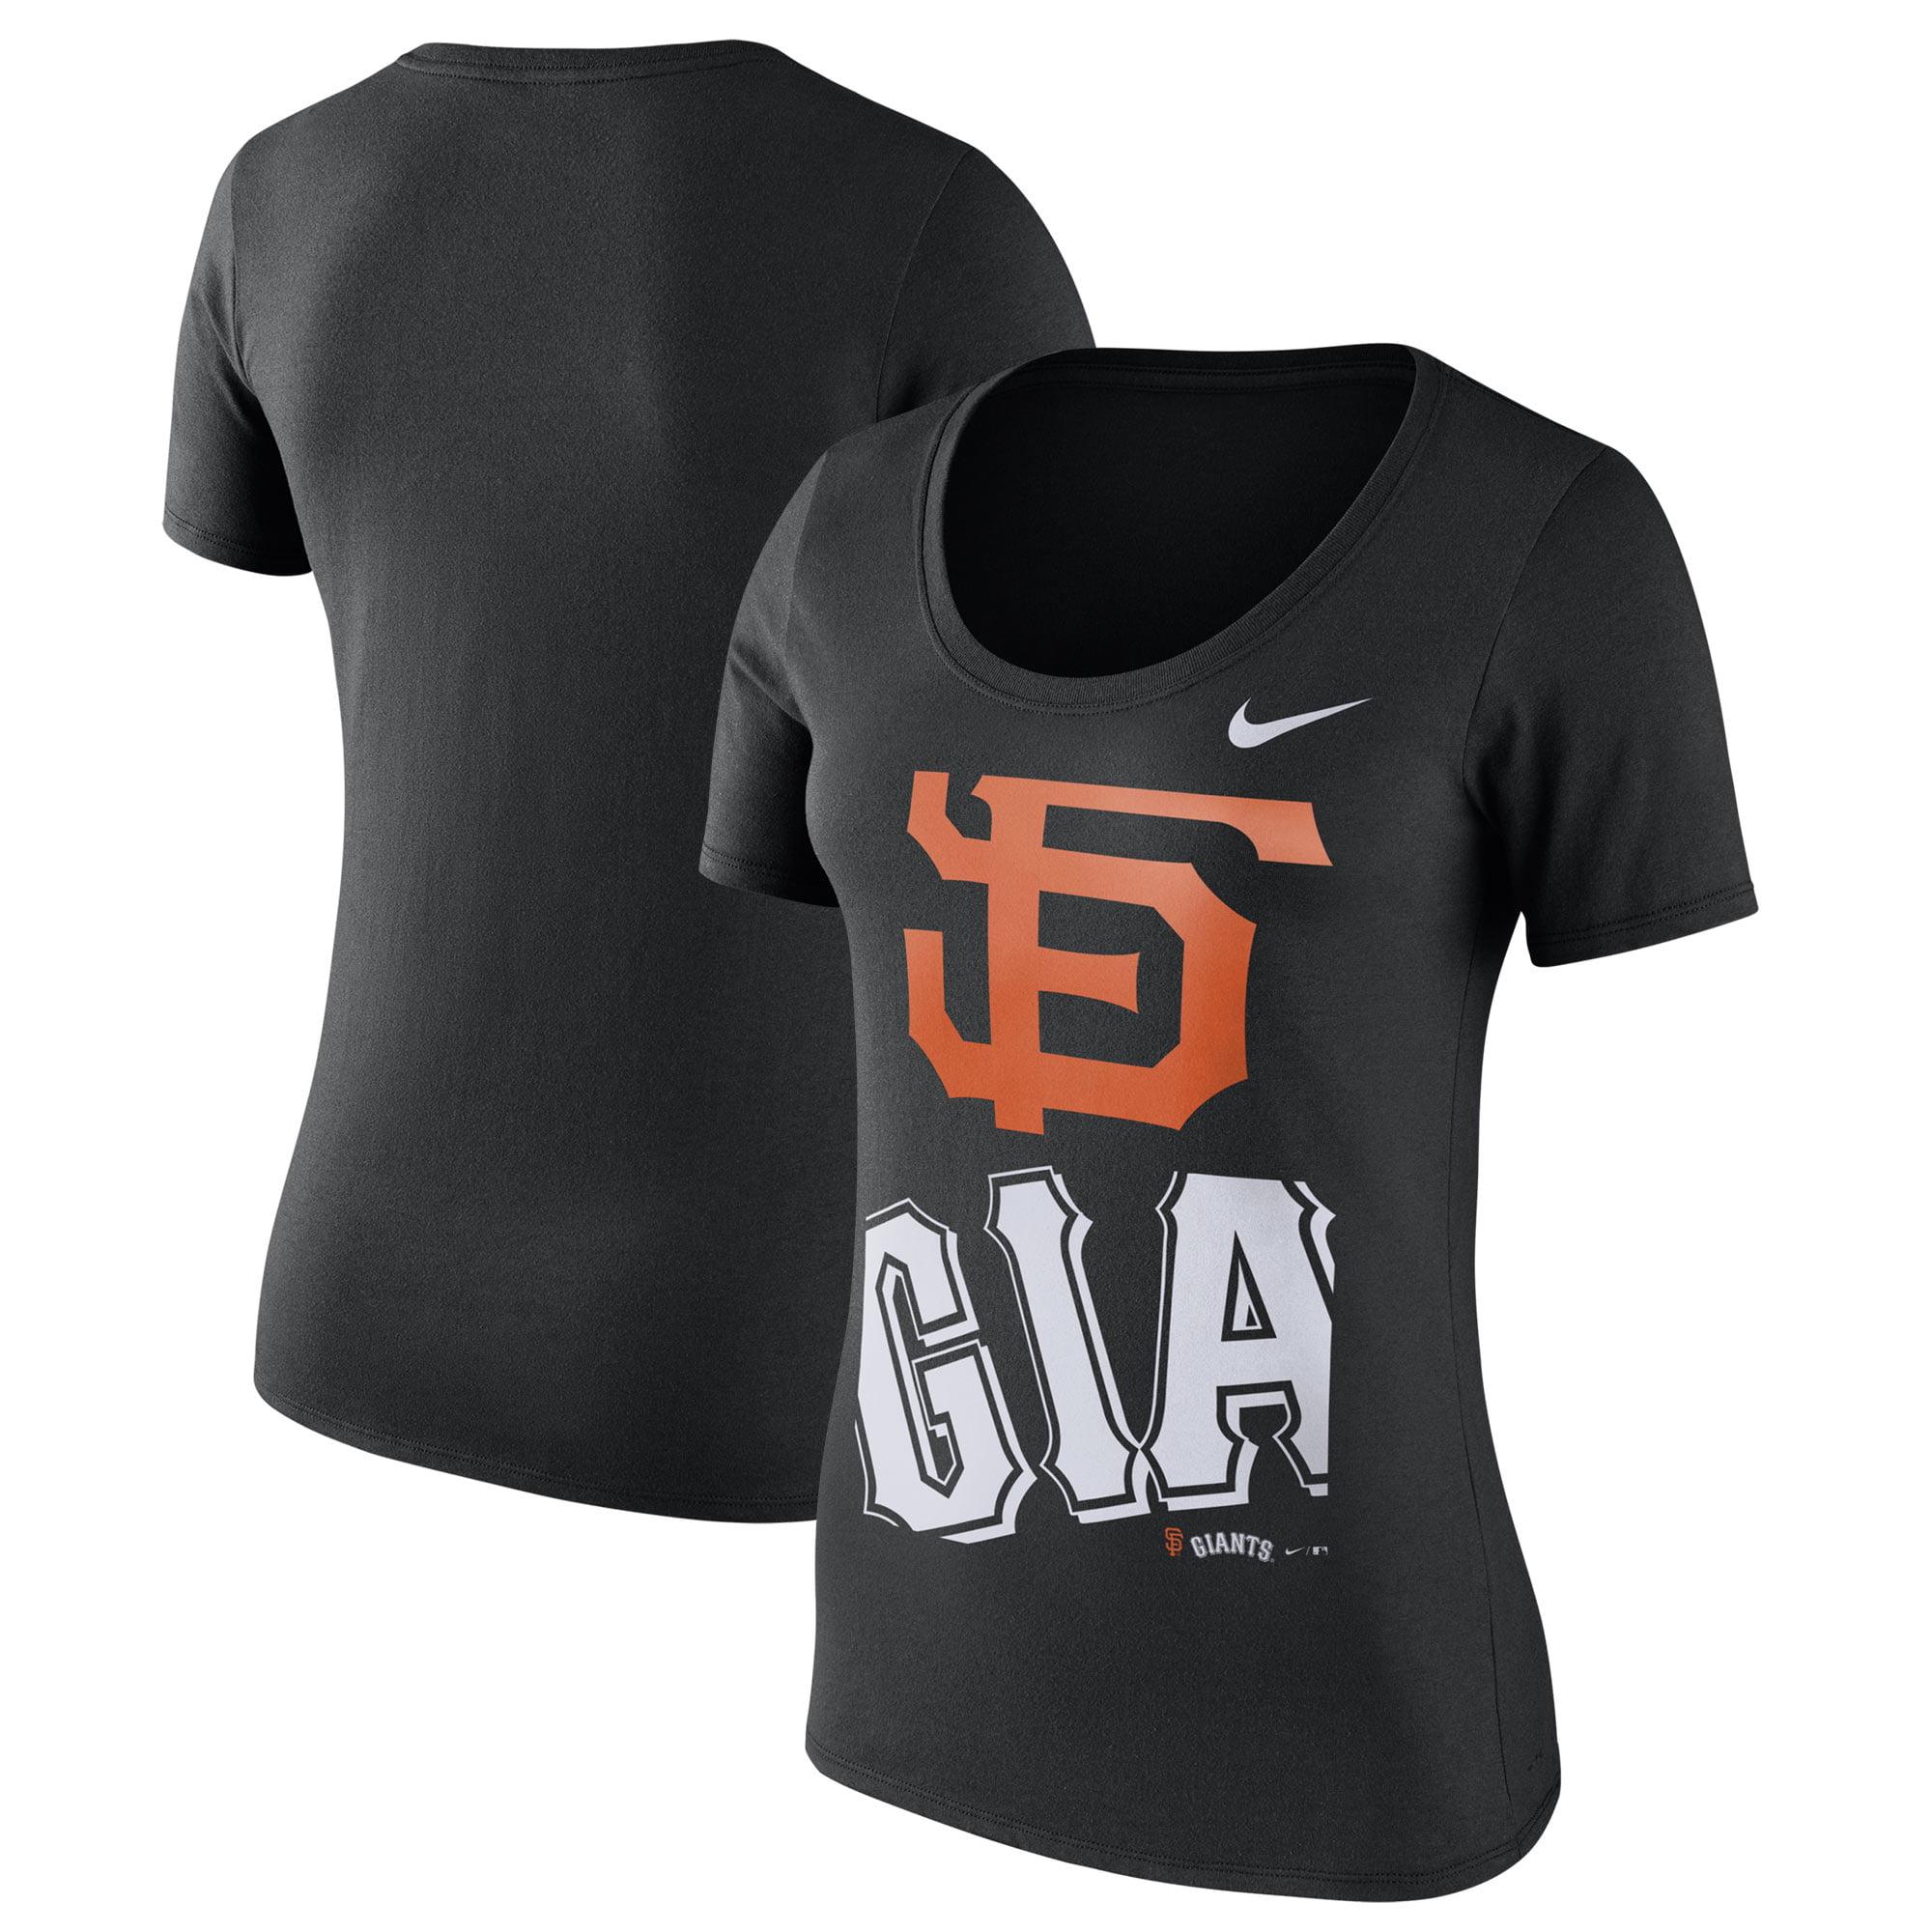 San Francisco Giants Nike Women's Stack Logo Scoop Neck T-Shirt - Black